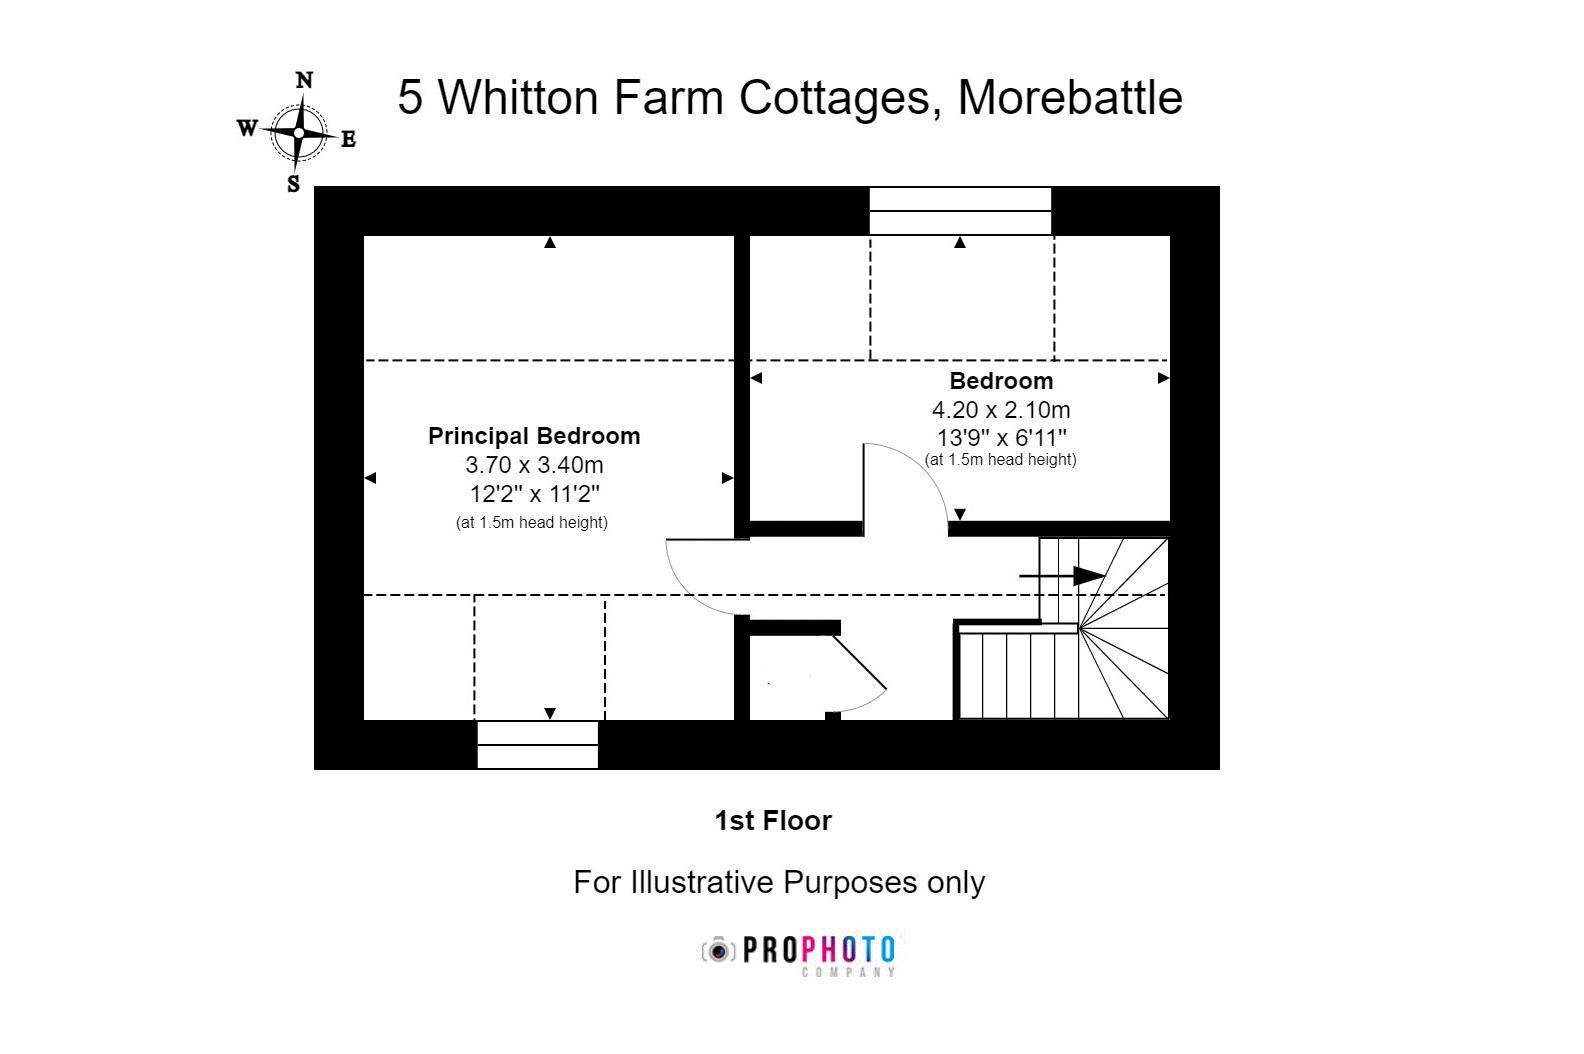 5 Whitton Farm Cottages First Floor